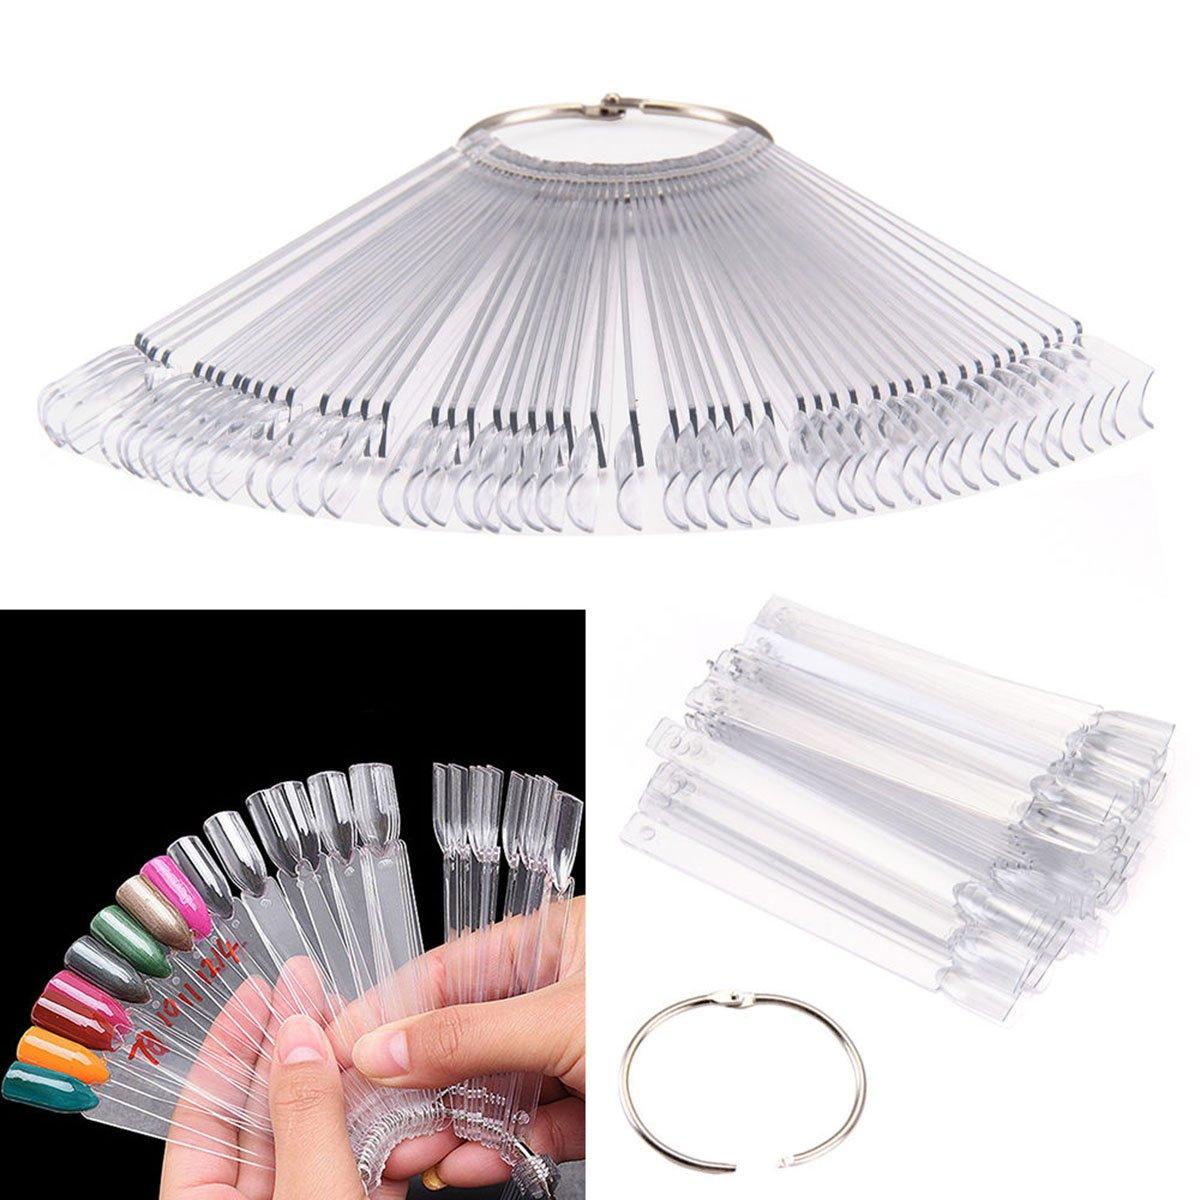 BinaryABC Nail Art Tips Colour Pop Sticks Display Fan Practice Starter Ring Clear DIY 100pcs